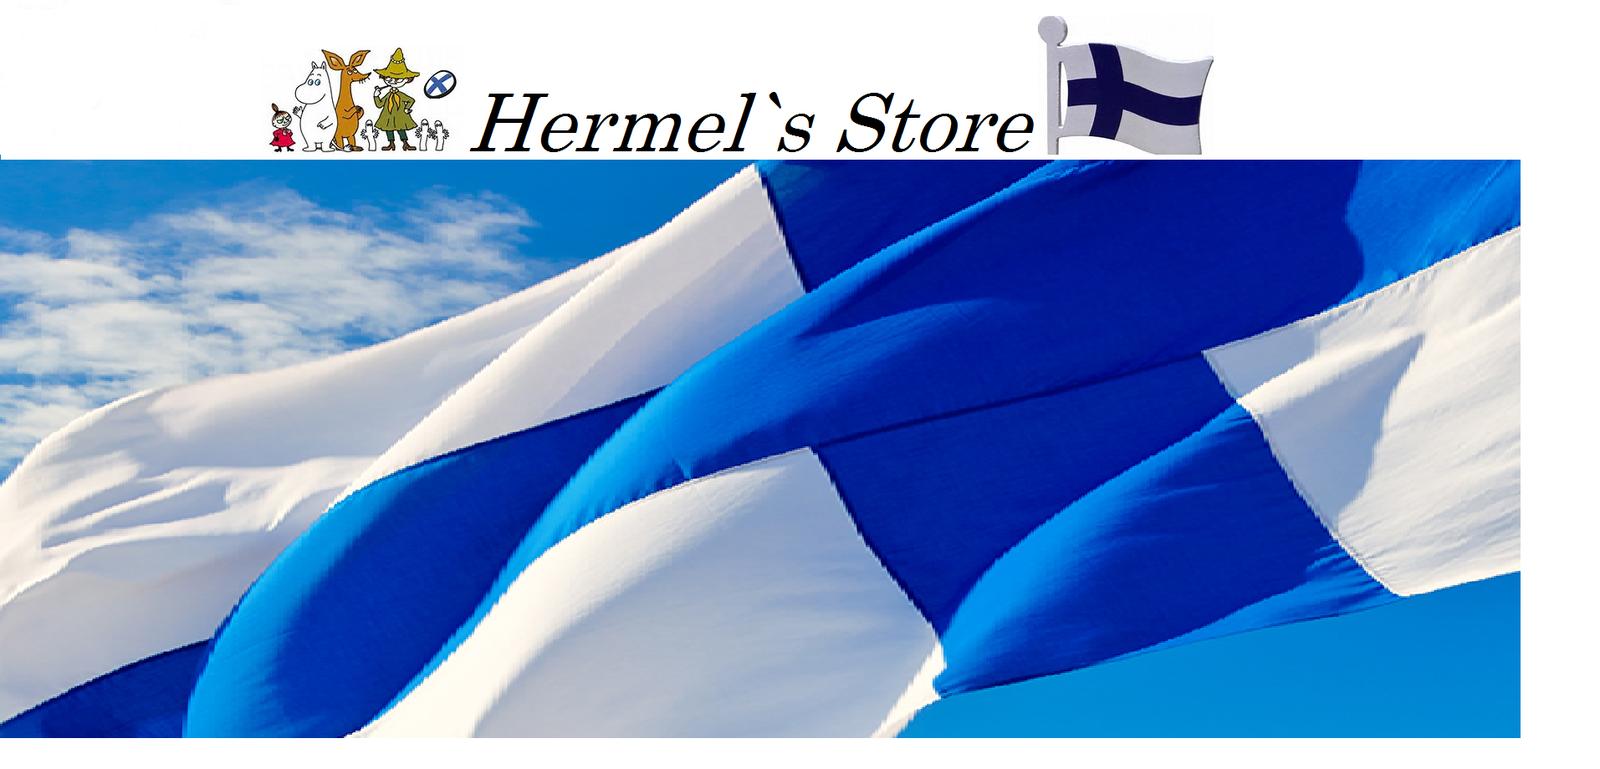 Hermel s Store